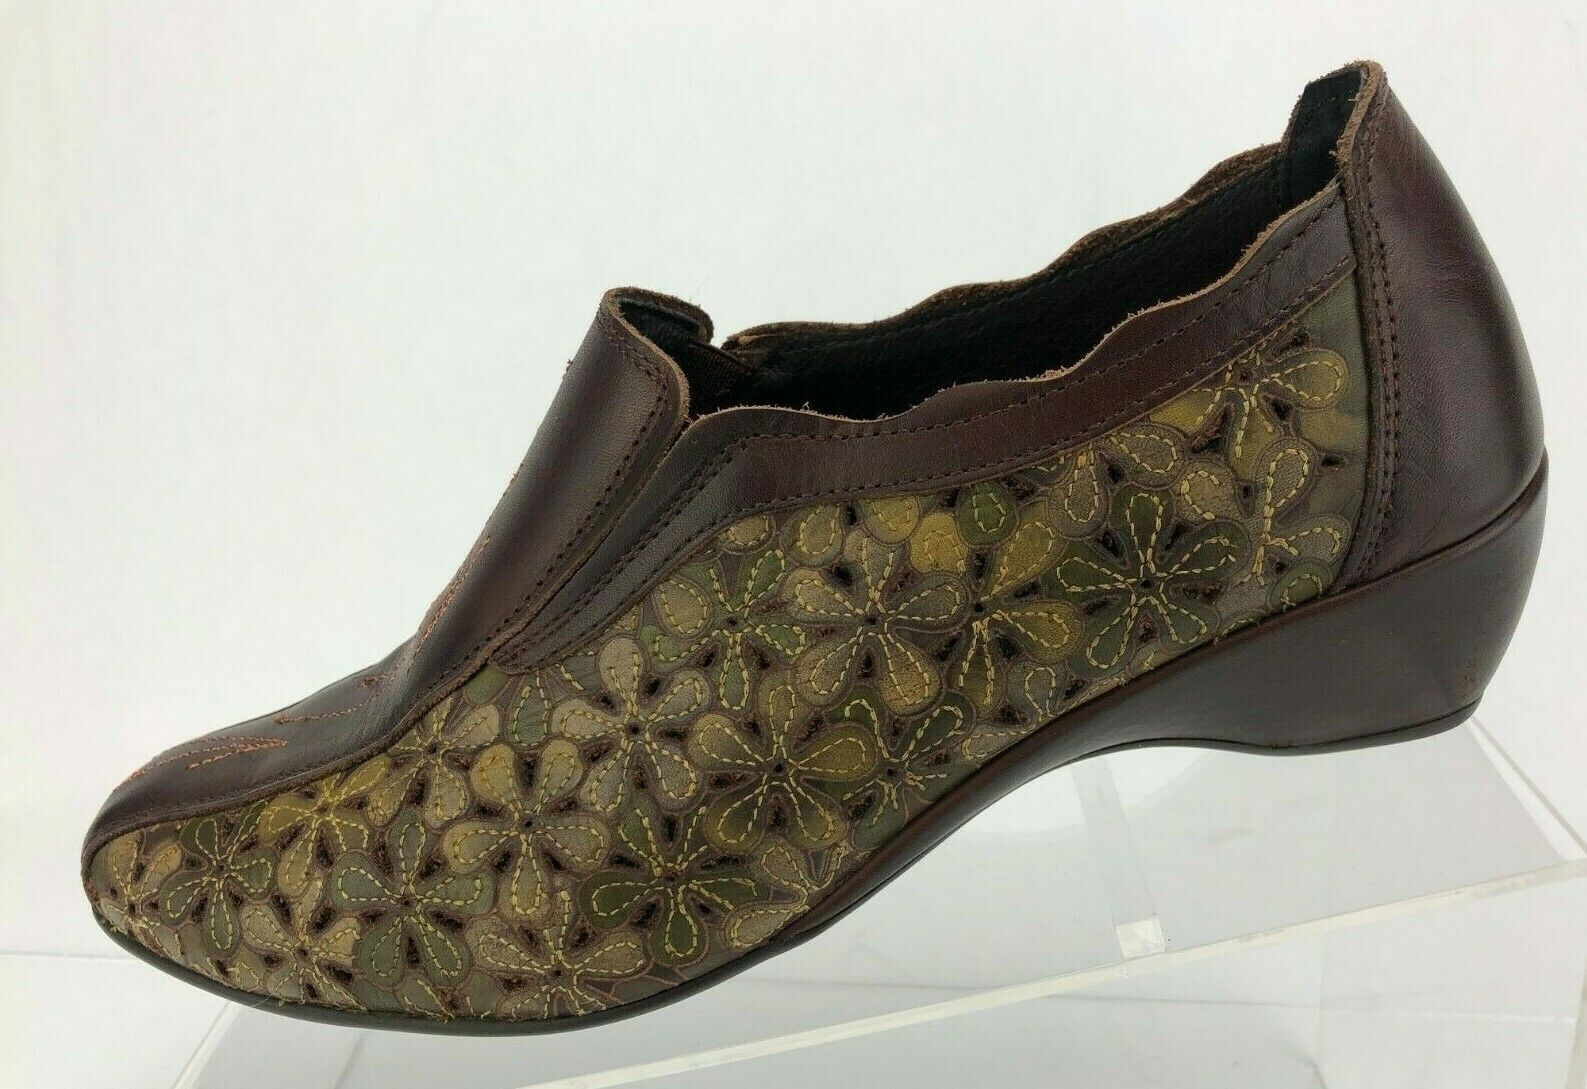 Pikolinos Loafers Floral Cutout braun Leather Comfort Slip On damen 39 8.5,9